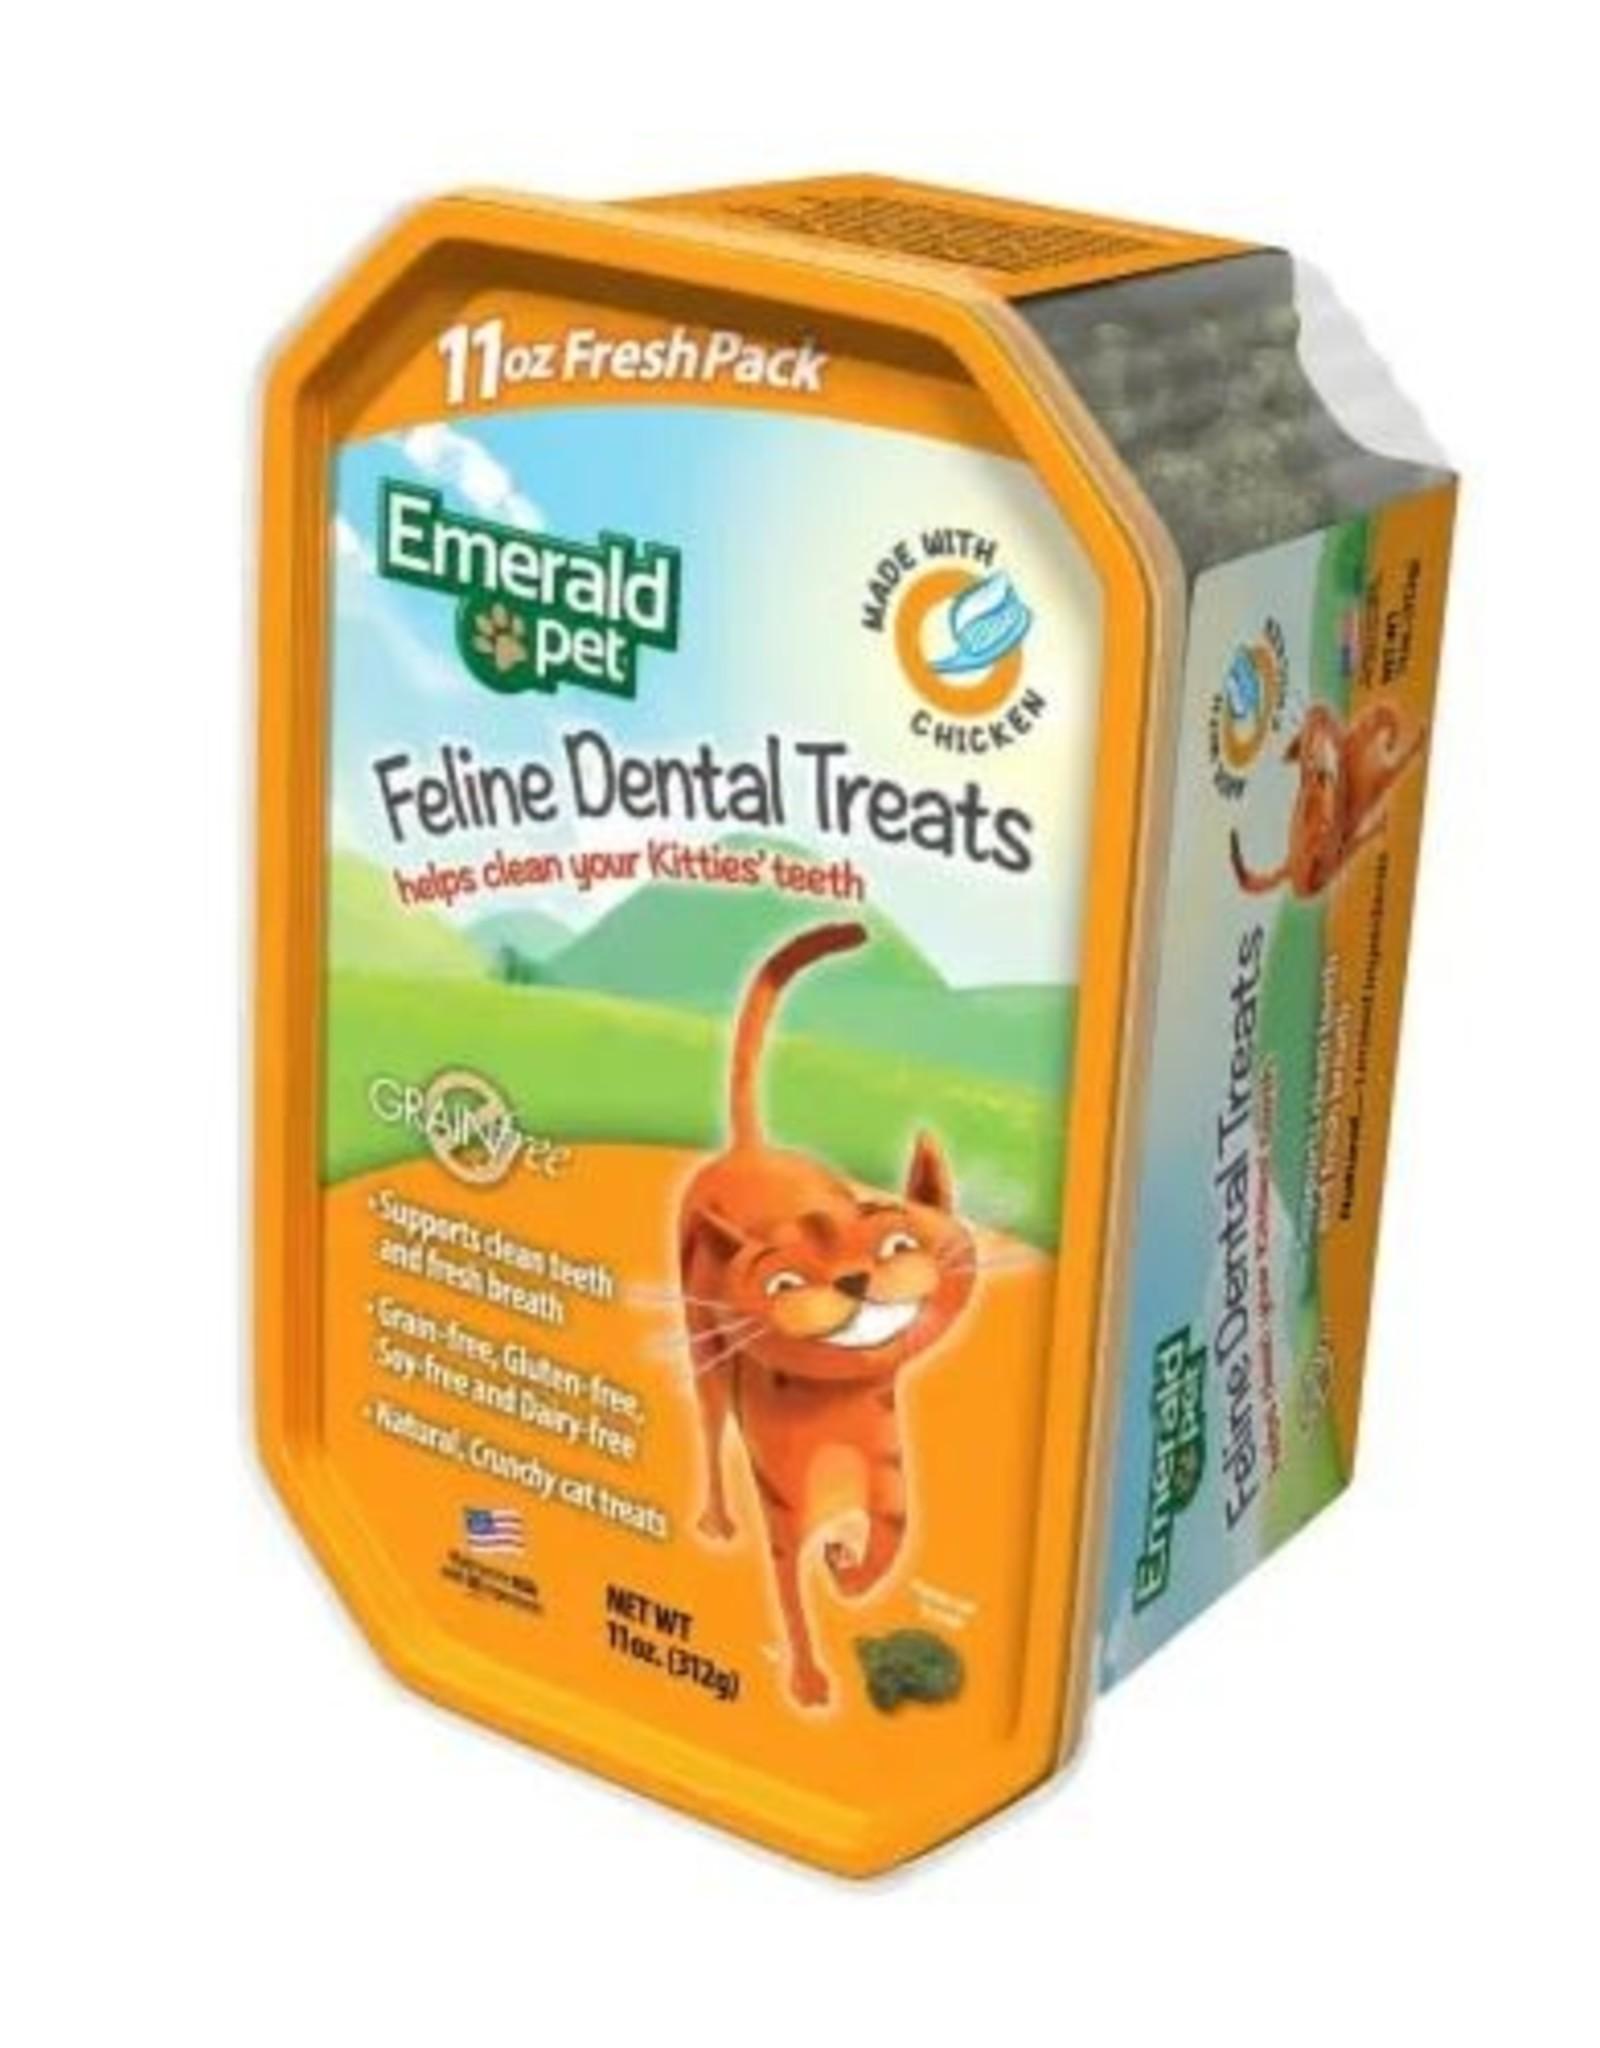 Emerald Pet Cat Dental Treat TUB Chicken 11oz